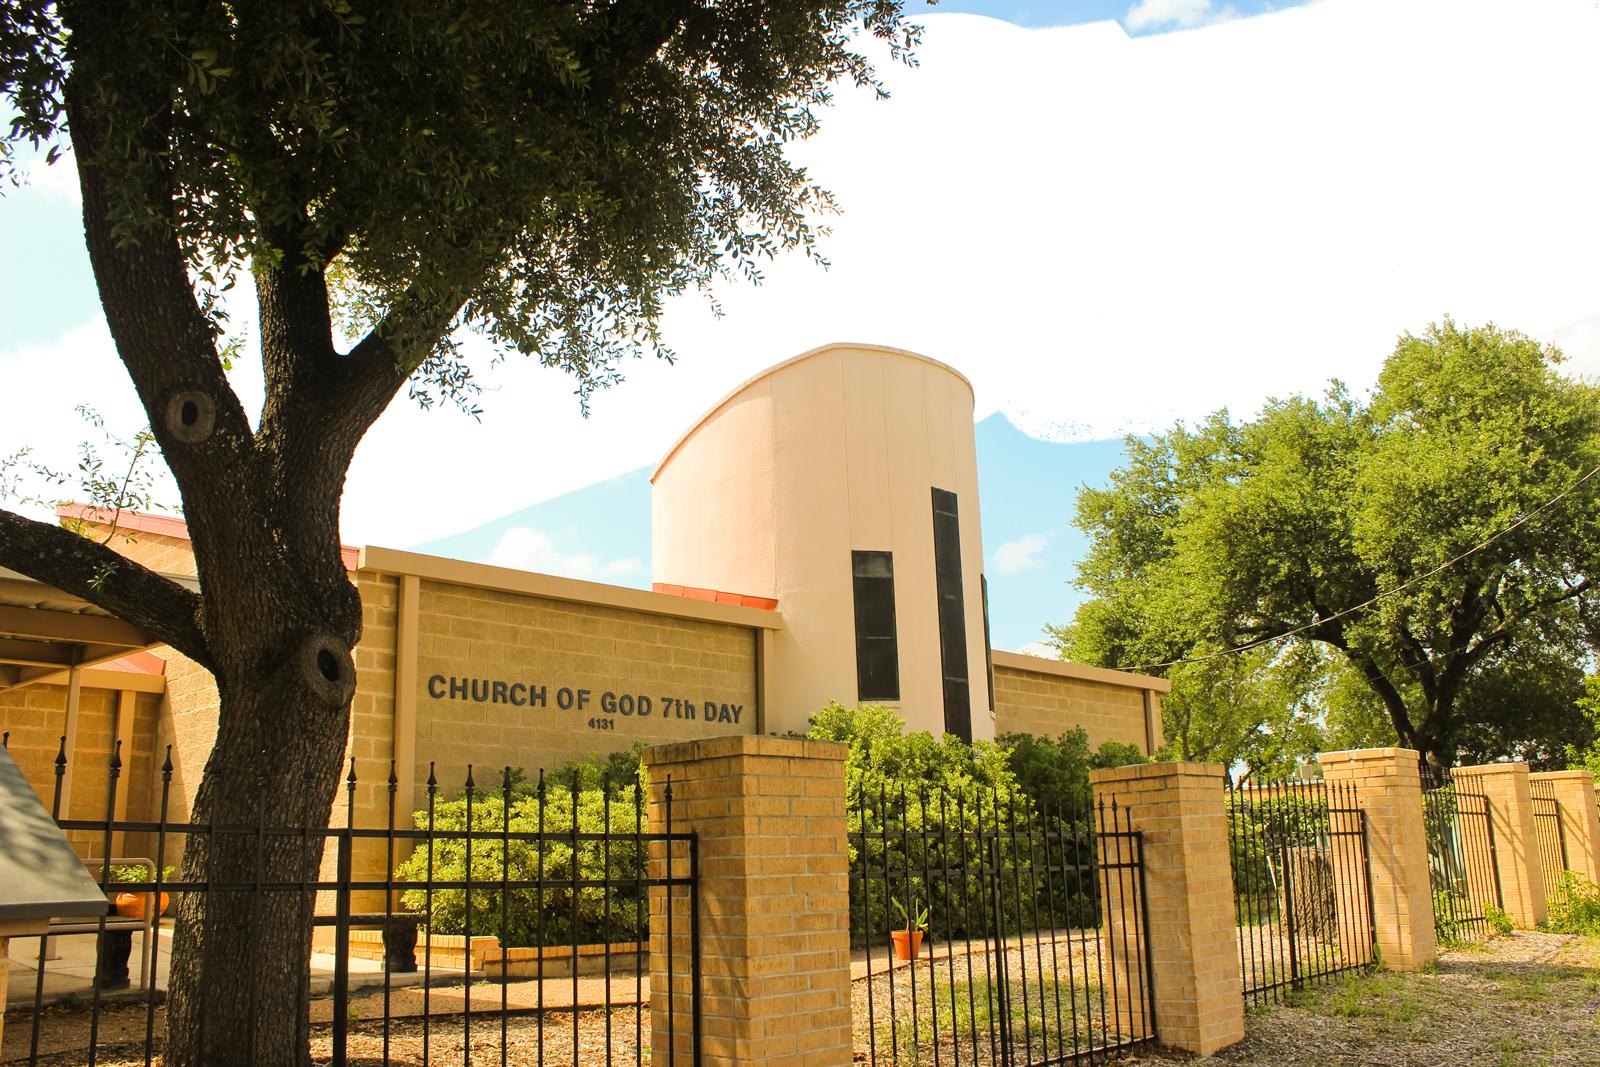 Midground   Church of God 7th Day Willard